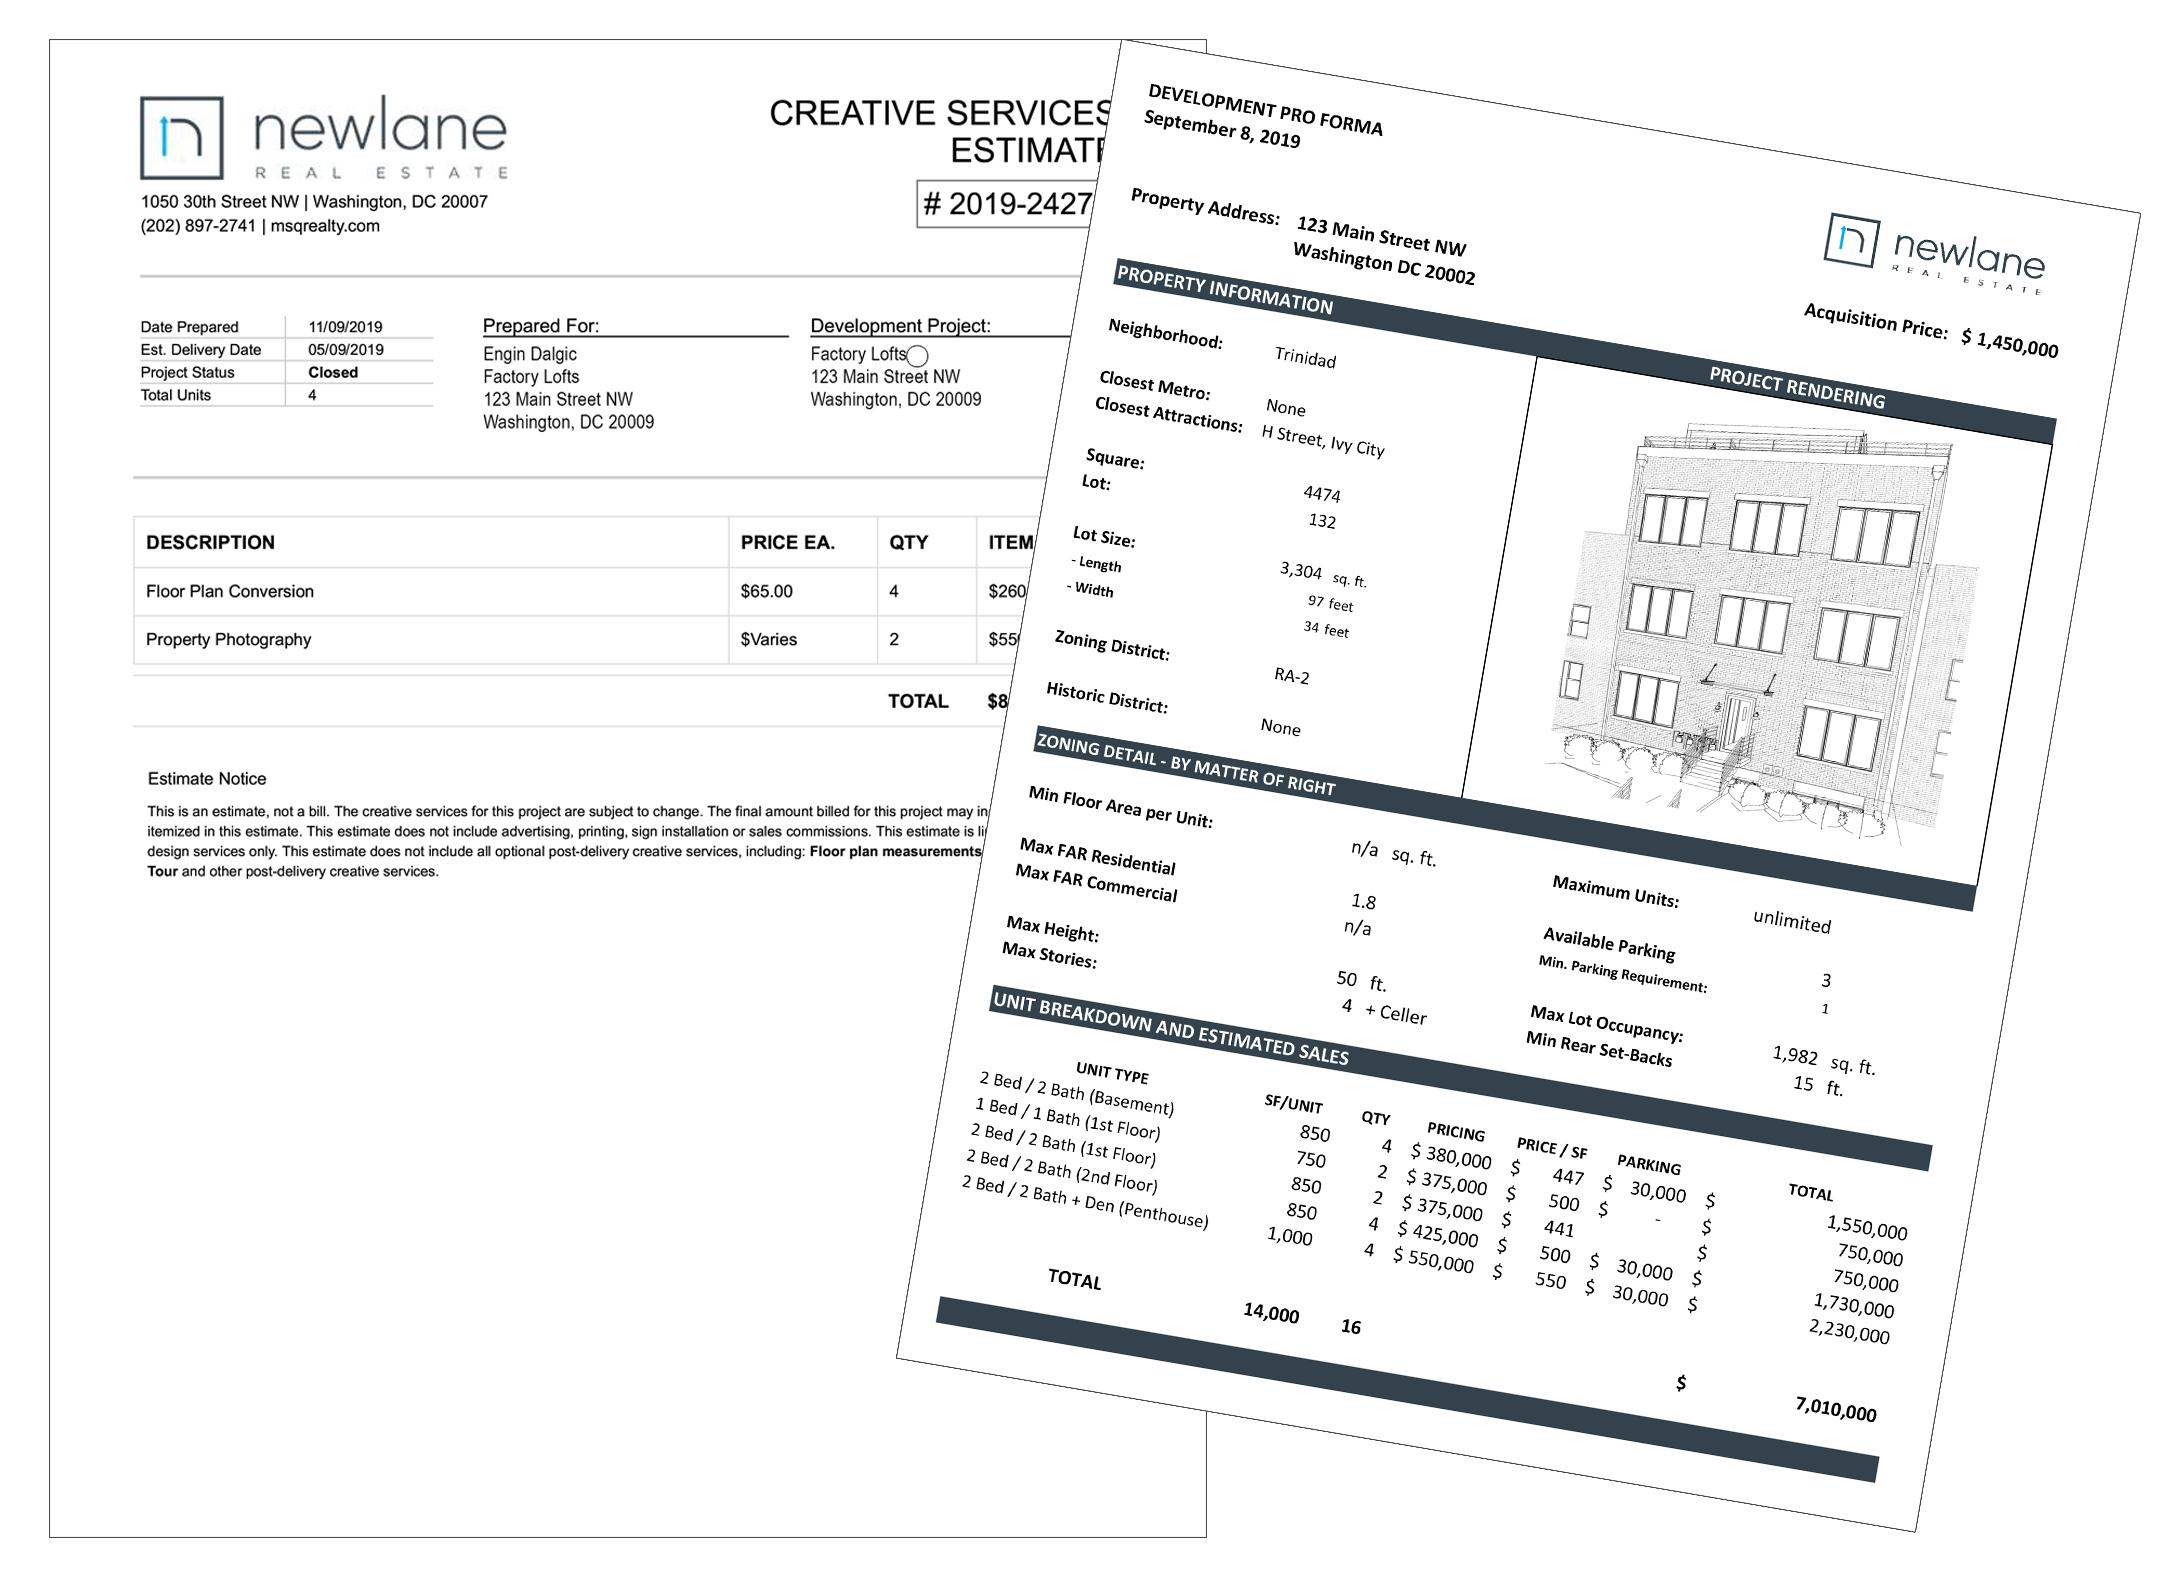 Pro-formas and creative service estimates